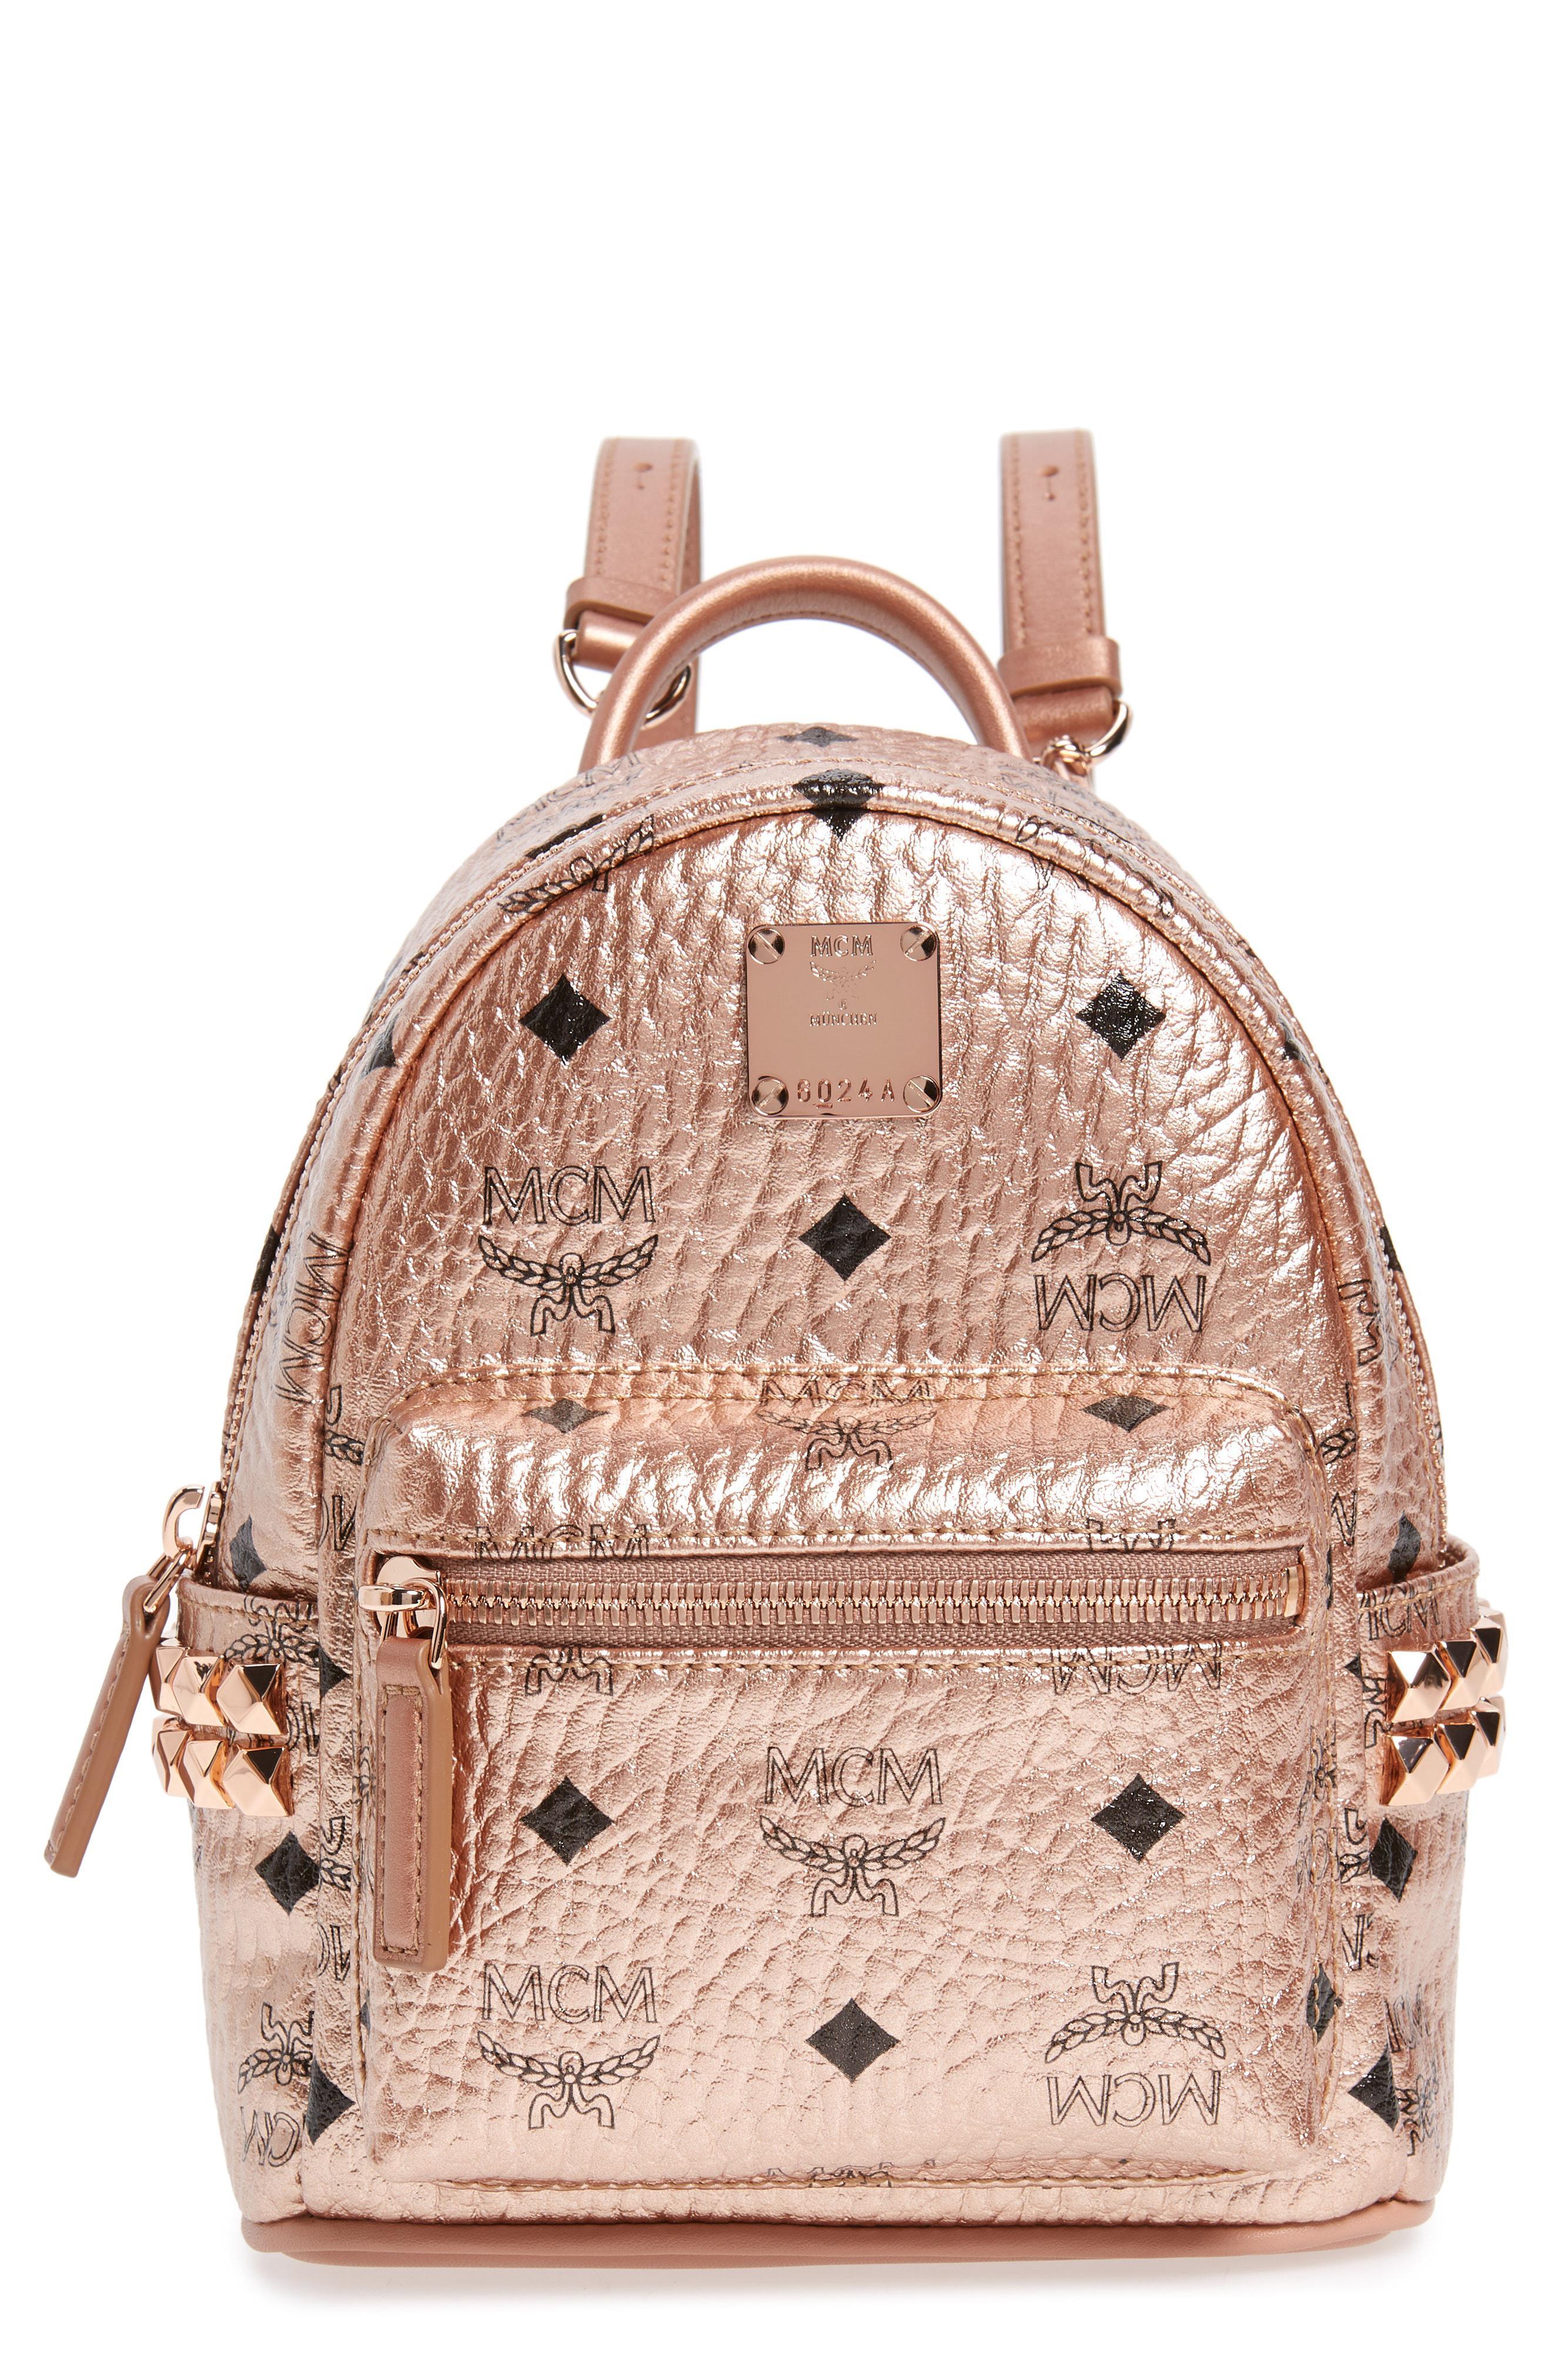 21554744ed80 MCM - Pink X-mini Stark Side Stud Coated Canvas Backpack - - Lyst. View  fullscreen